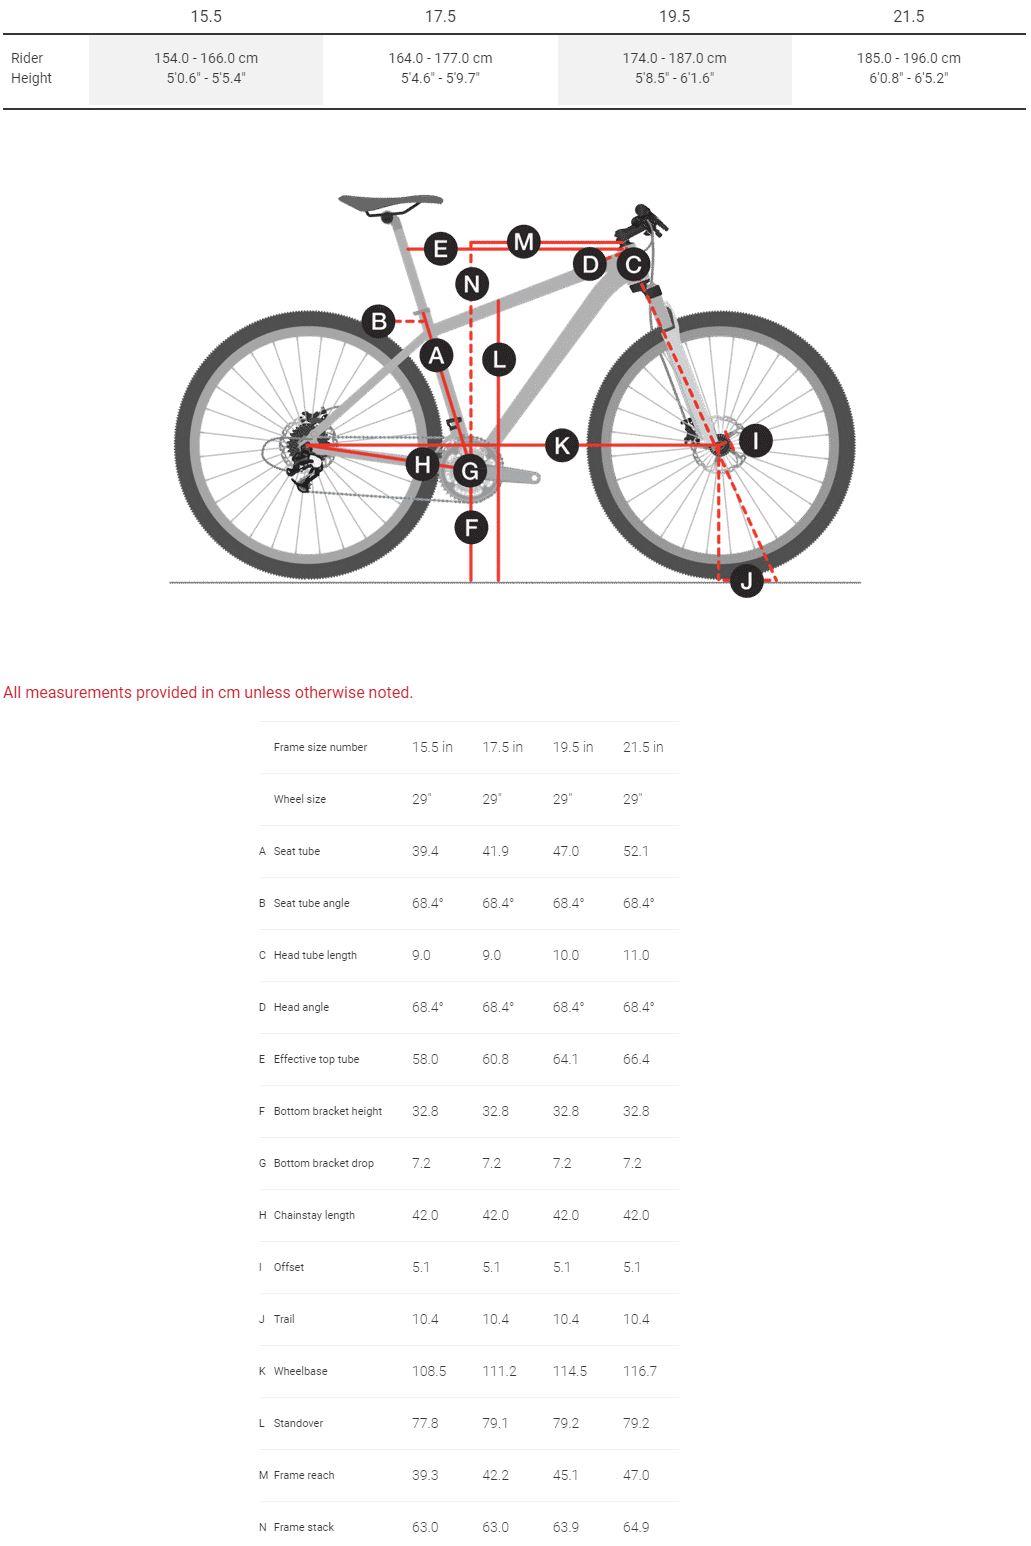 Trek Stache Geometry Chart